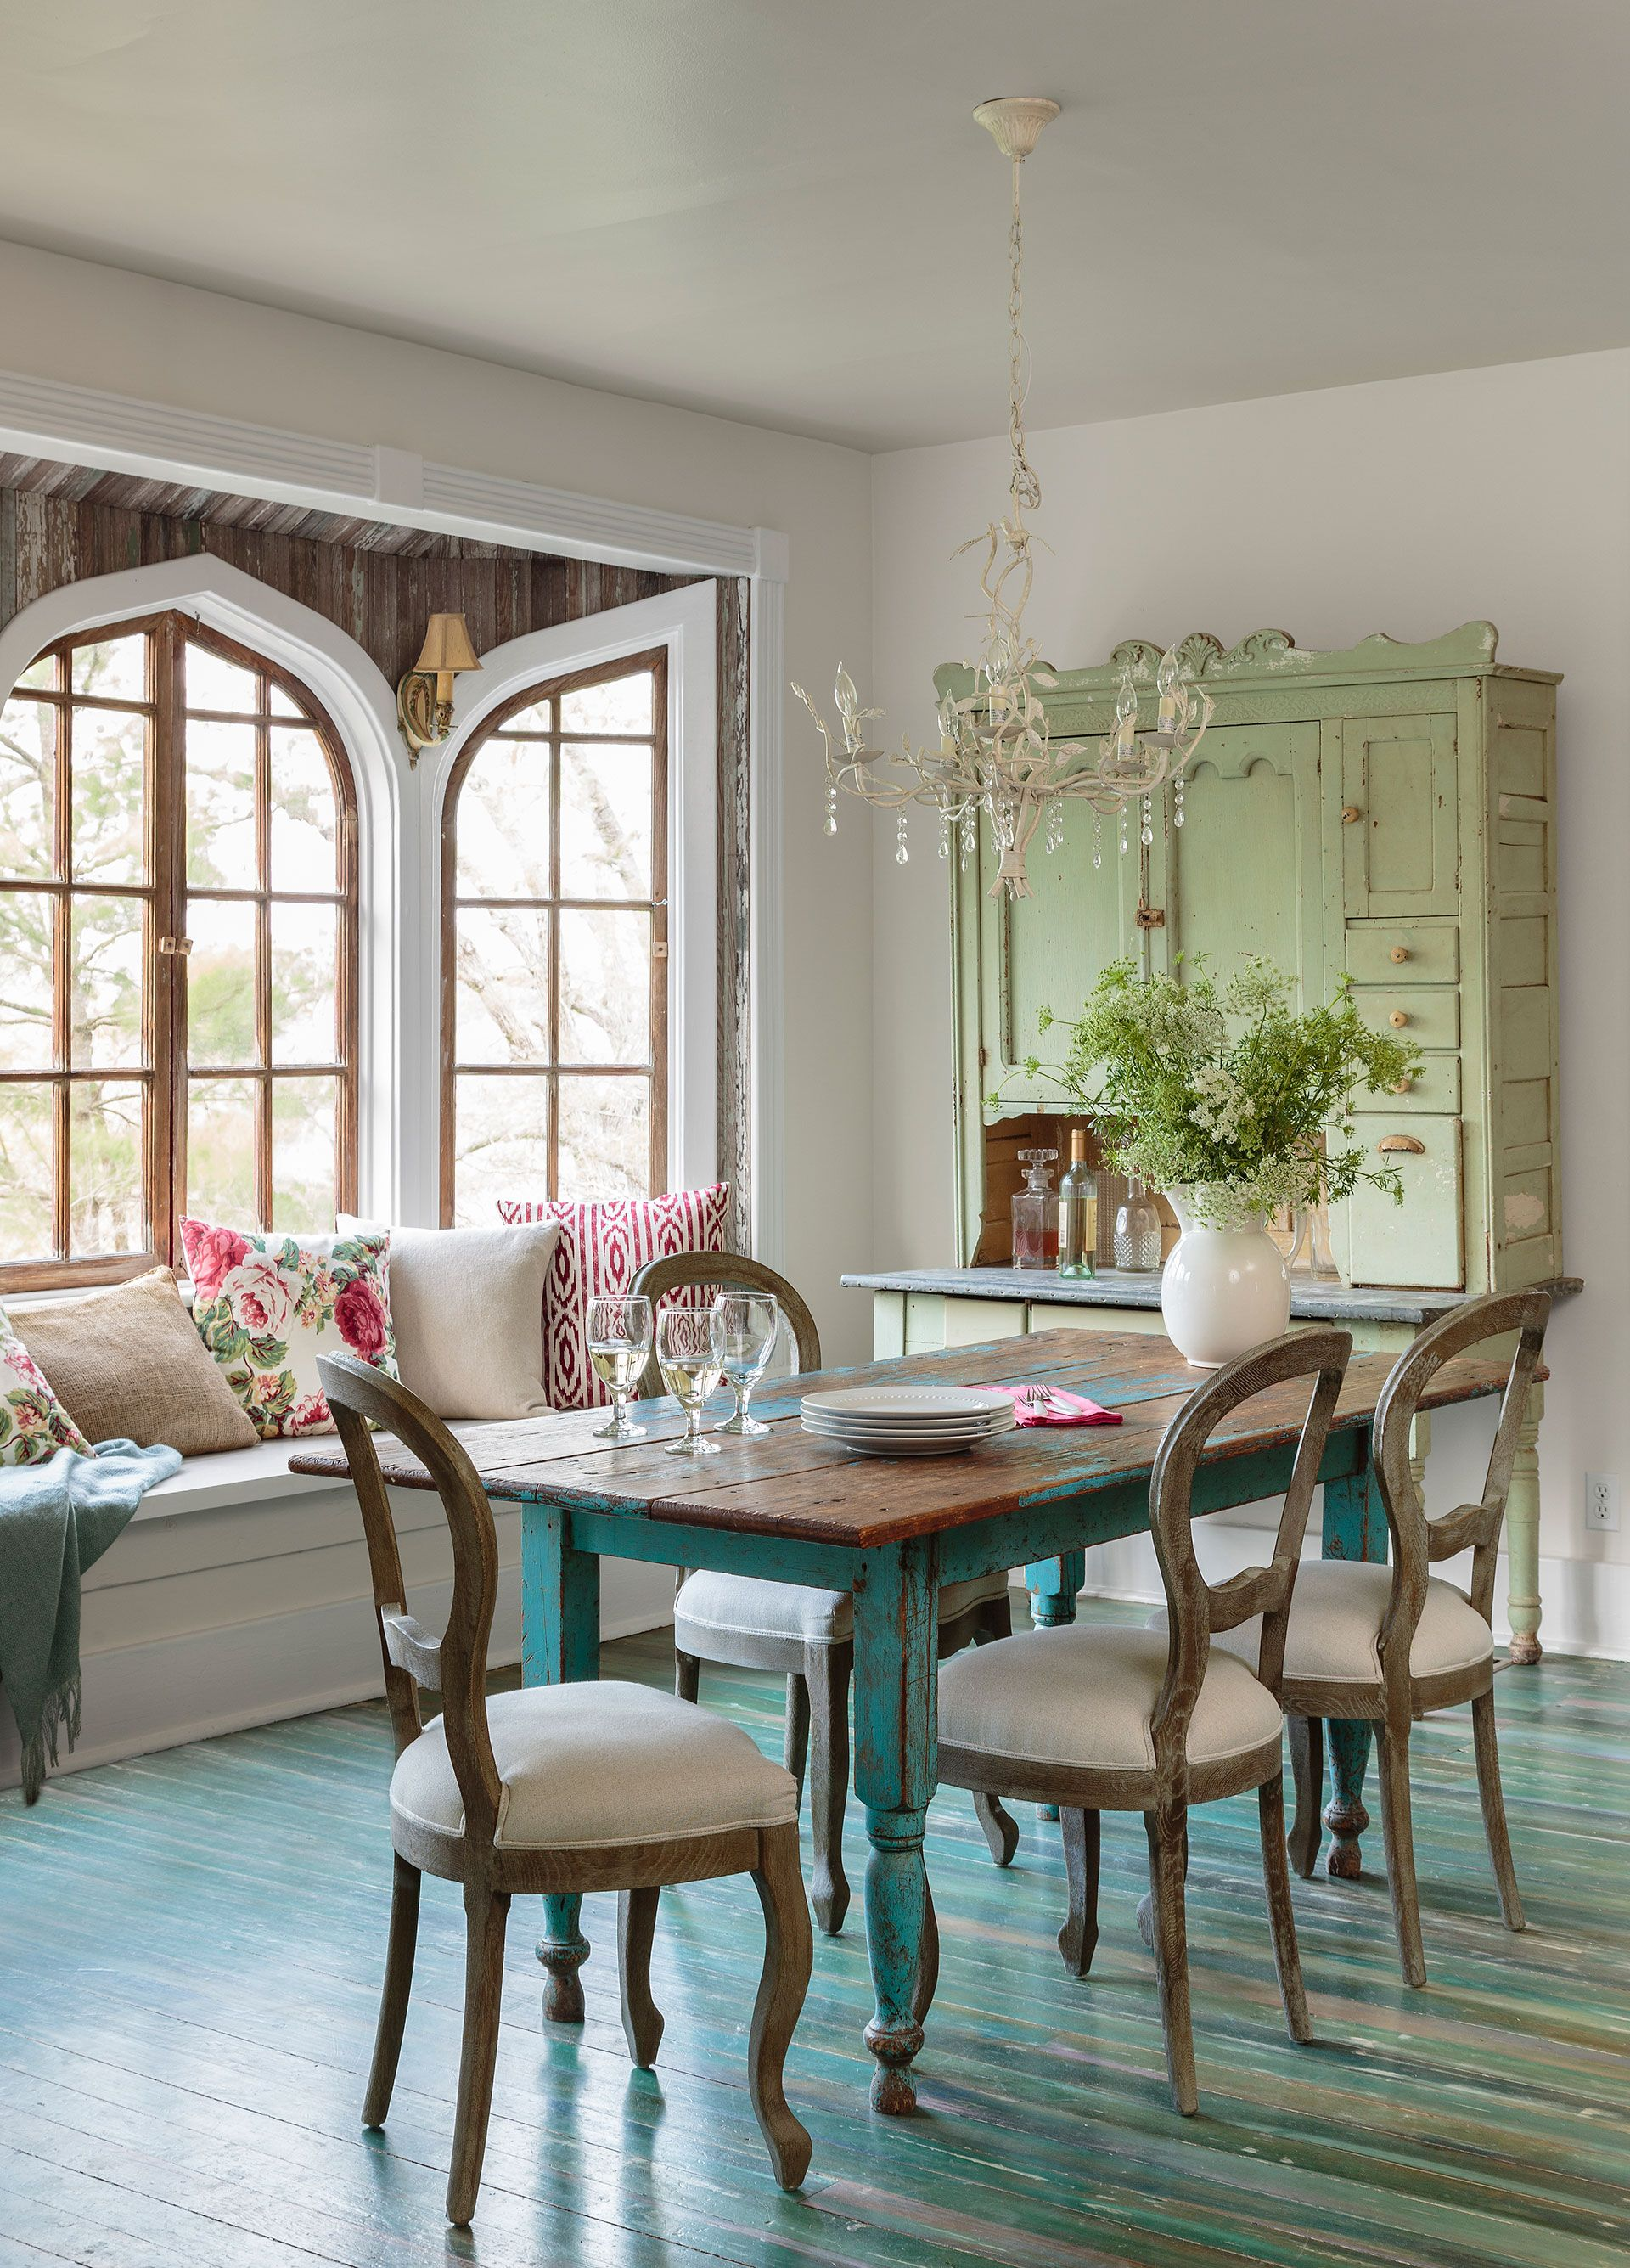 17 Lovely And Quaint Cottage Decorating Ideas Cottage Dining Rooms Country Dining Rooms Dining Room Decor